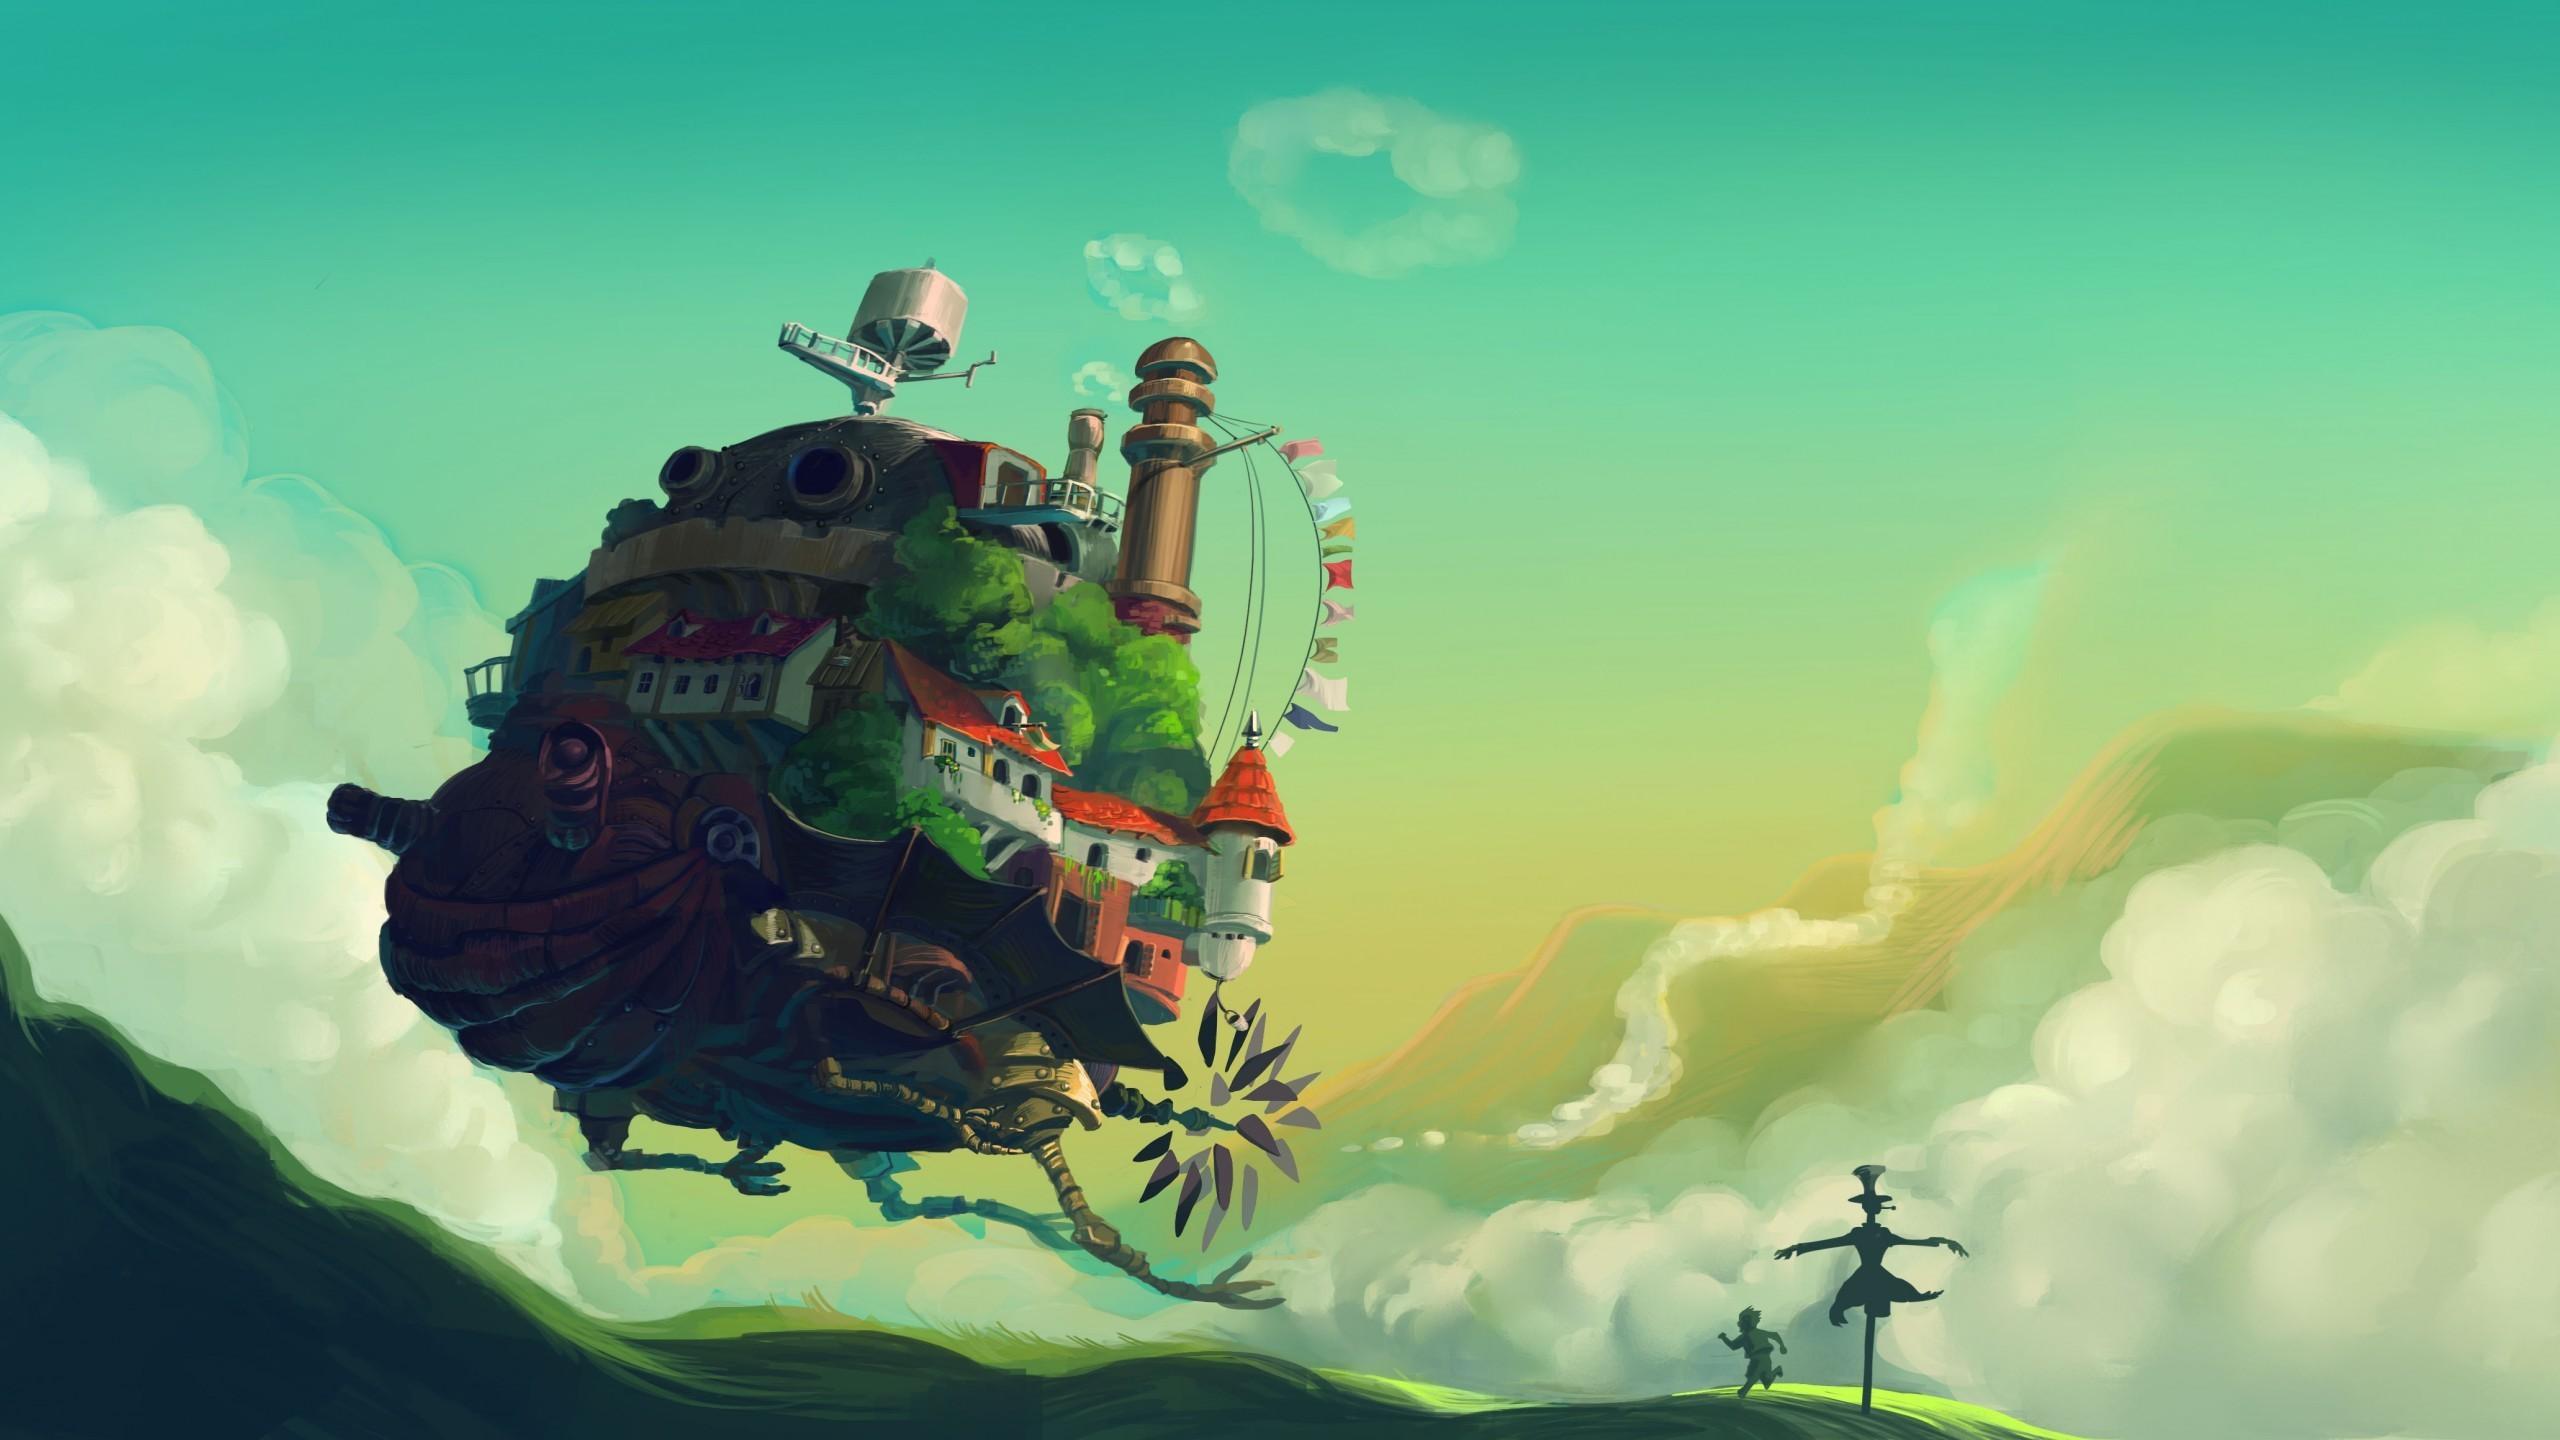 General 2560x1440 Studio Ghibli Howl's Moving Castle fantasy art artwork anime digital art